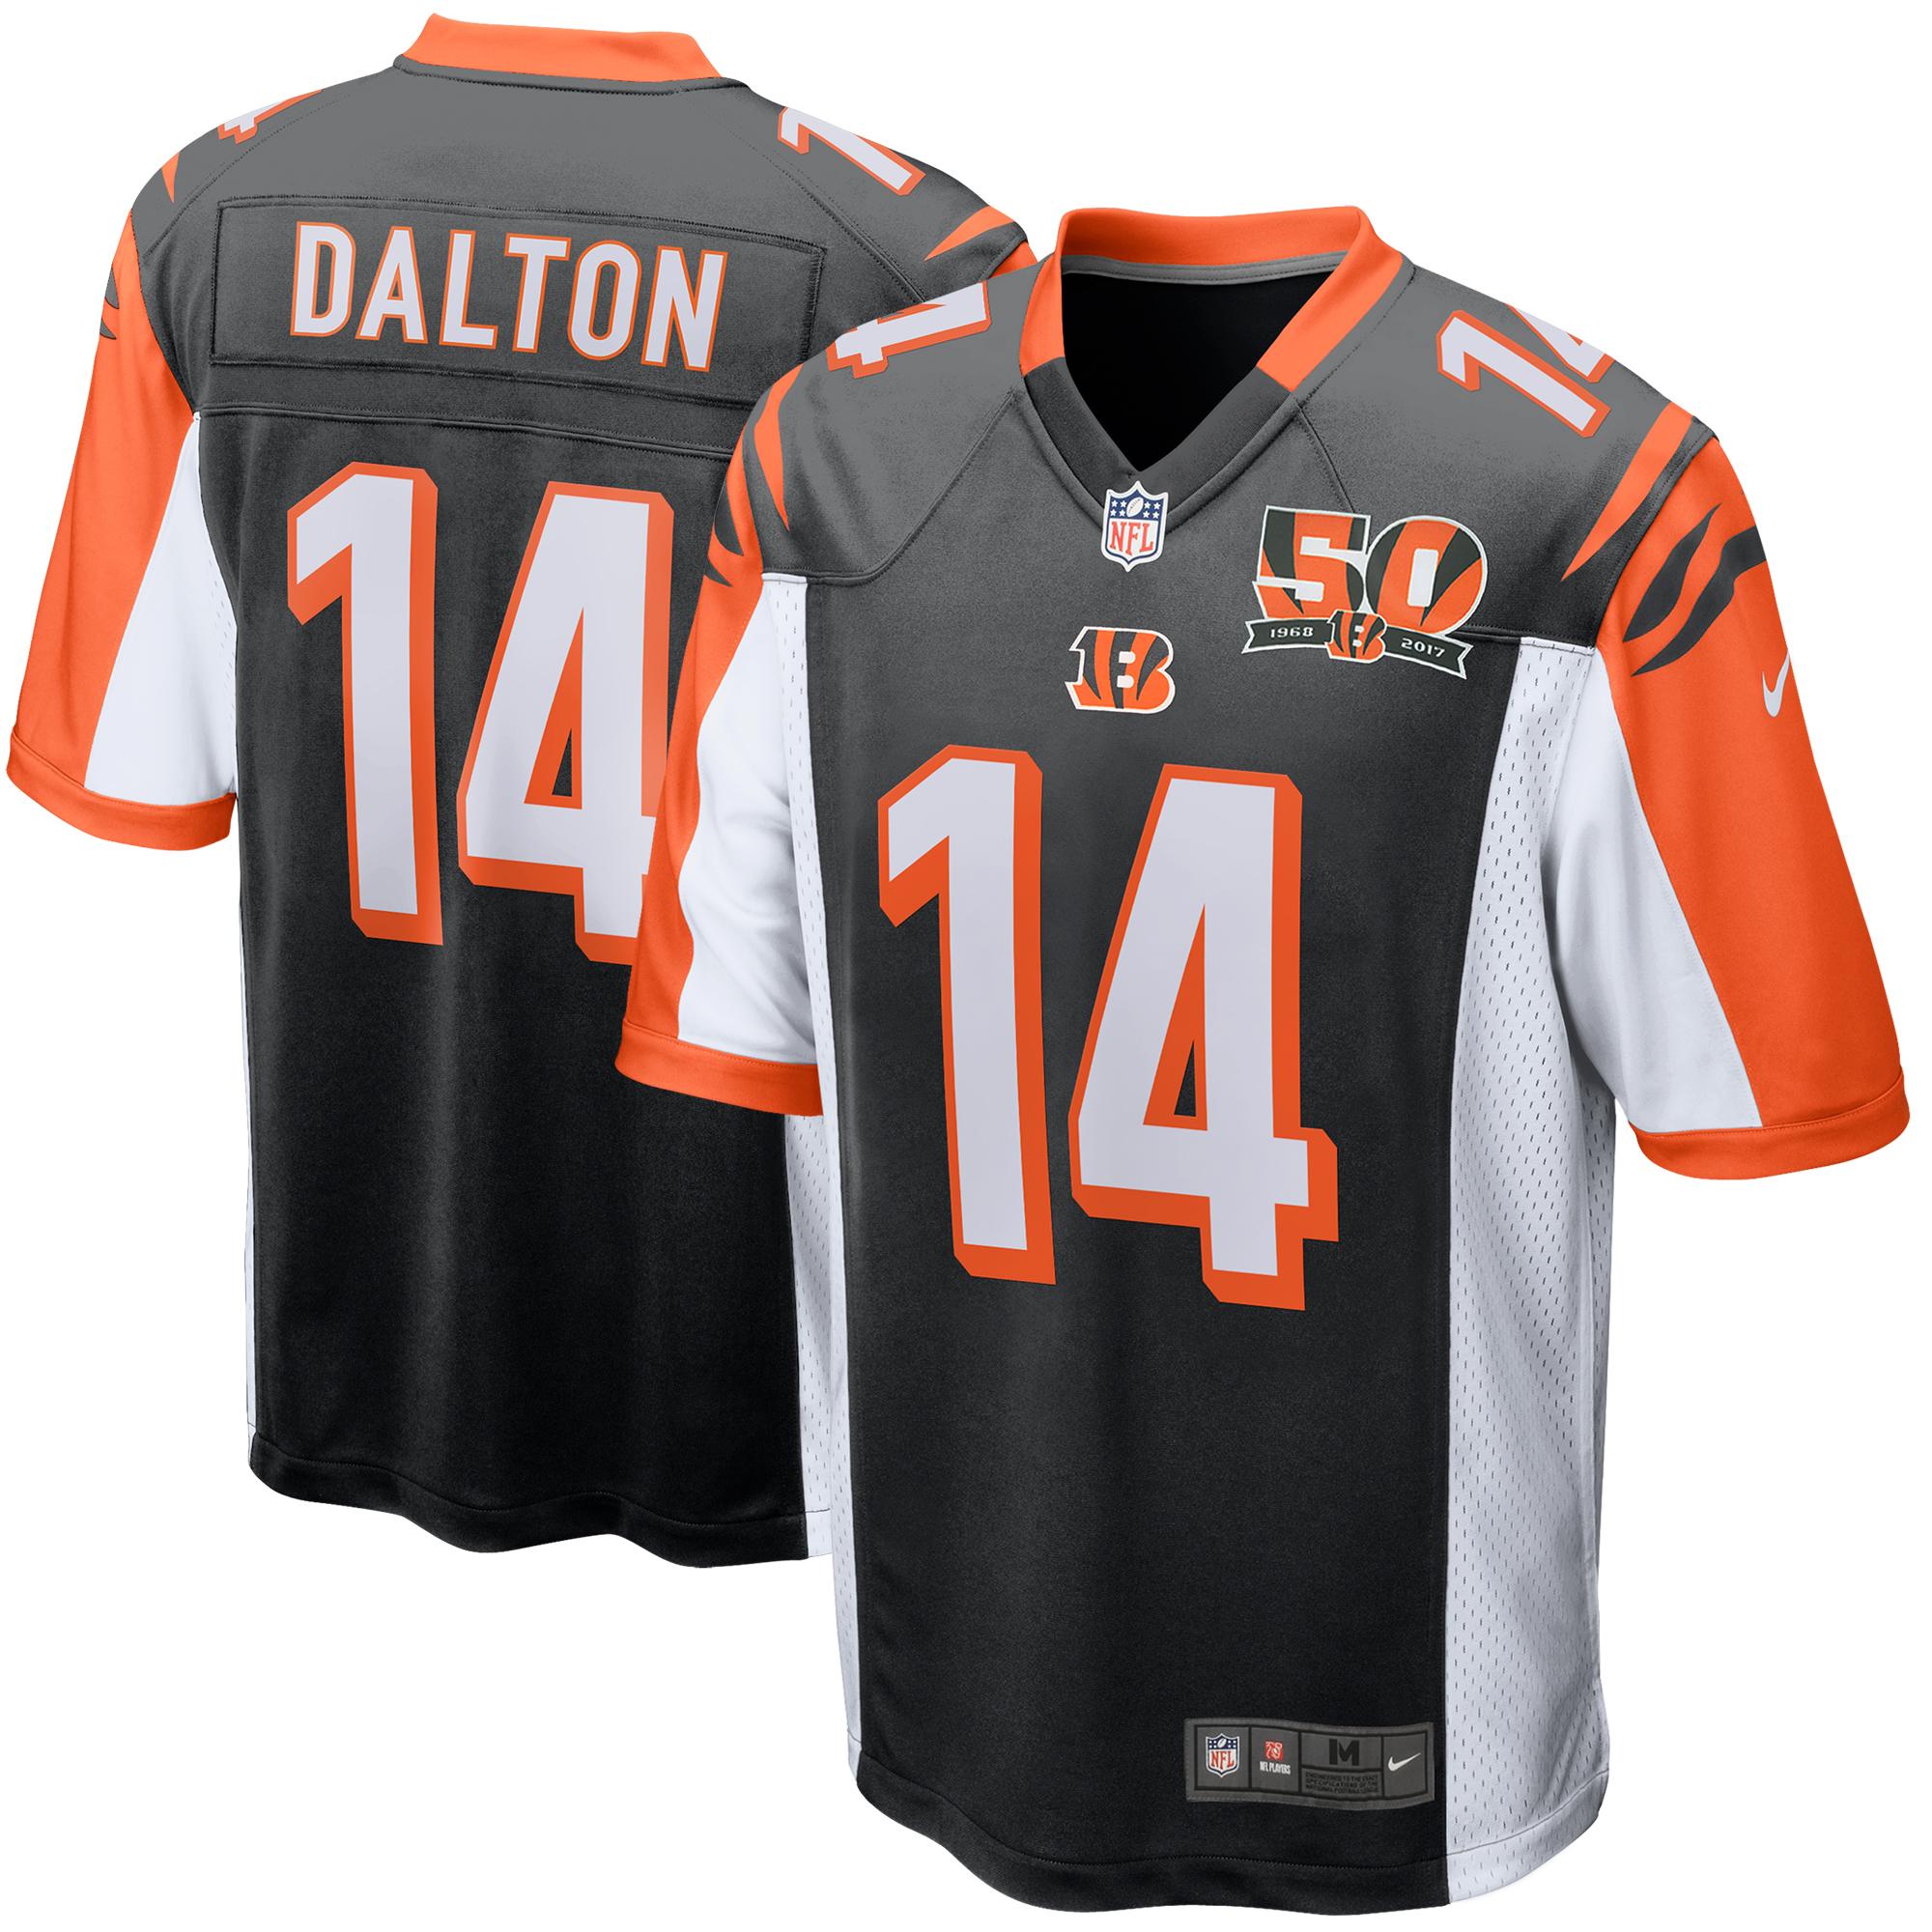 Andy Dalton Cincinnati Bengals Nike 50th Anniversary Patch Game Jersey - Black